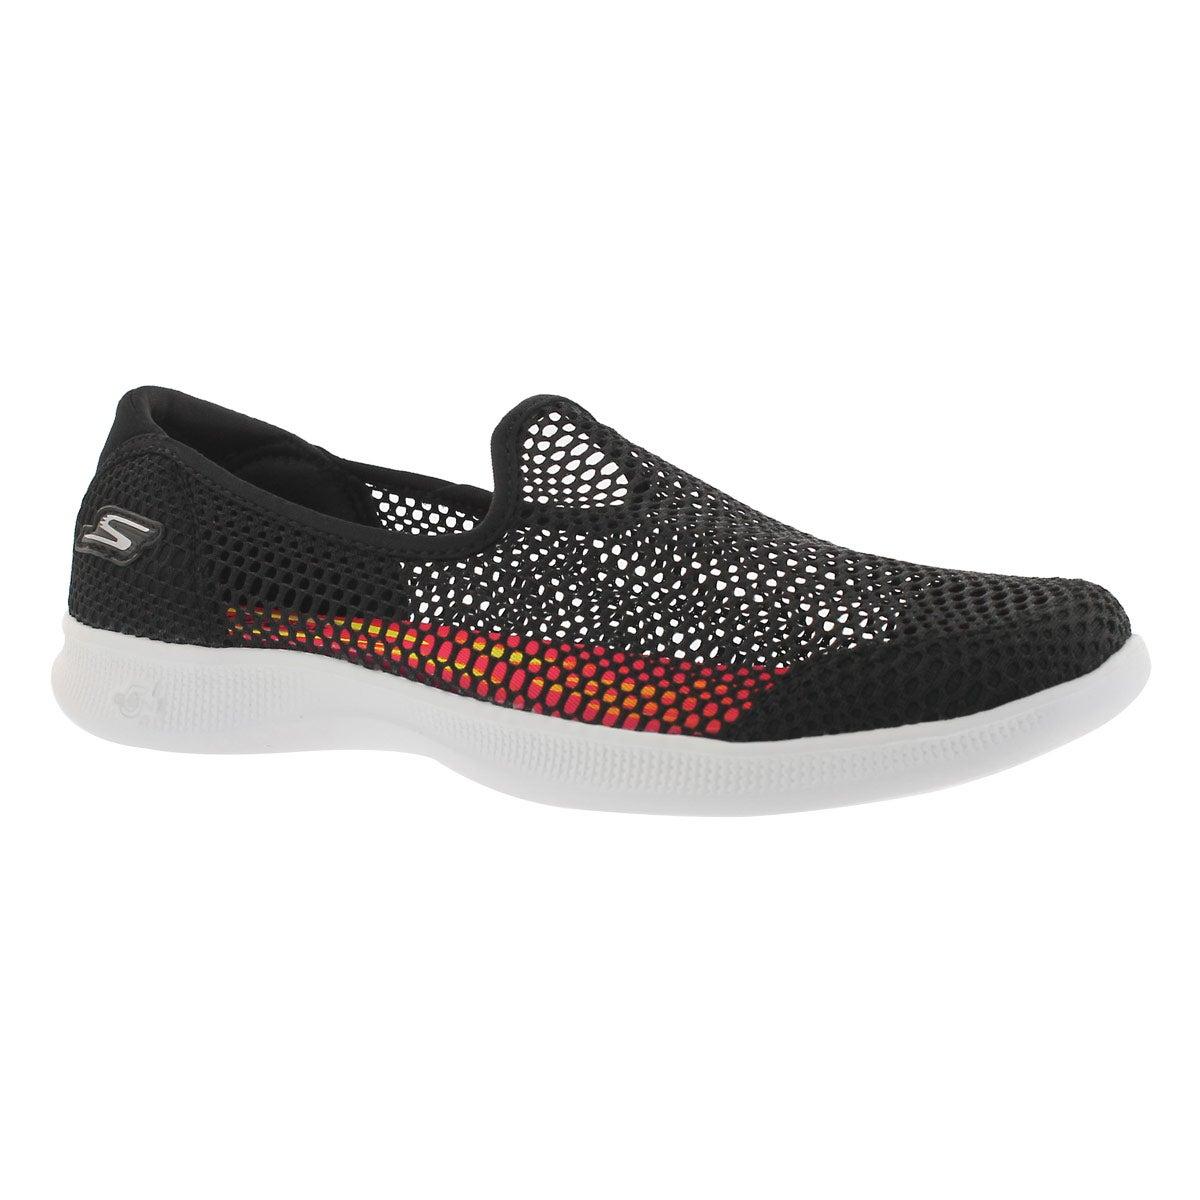 Women's GO STEP LITE WISPY black walking shoes